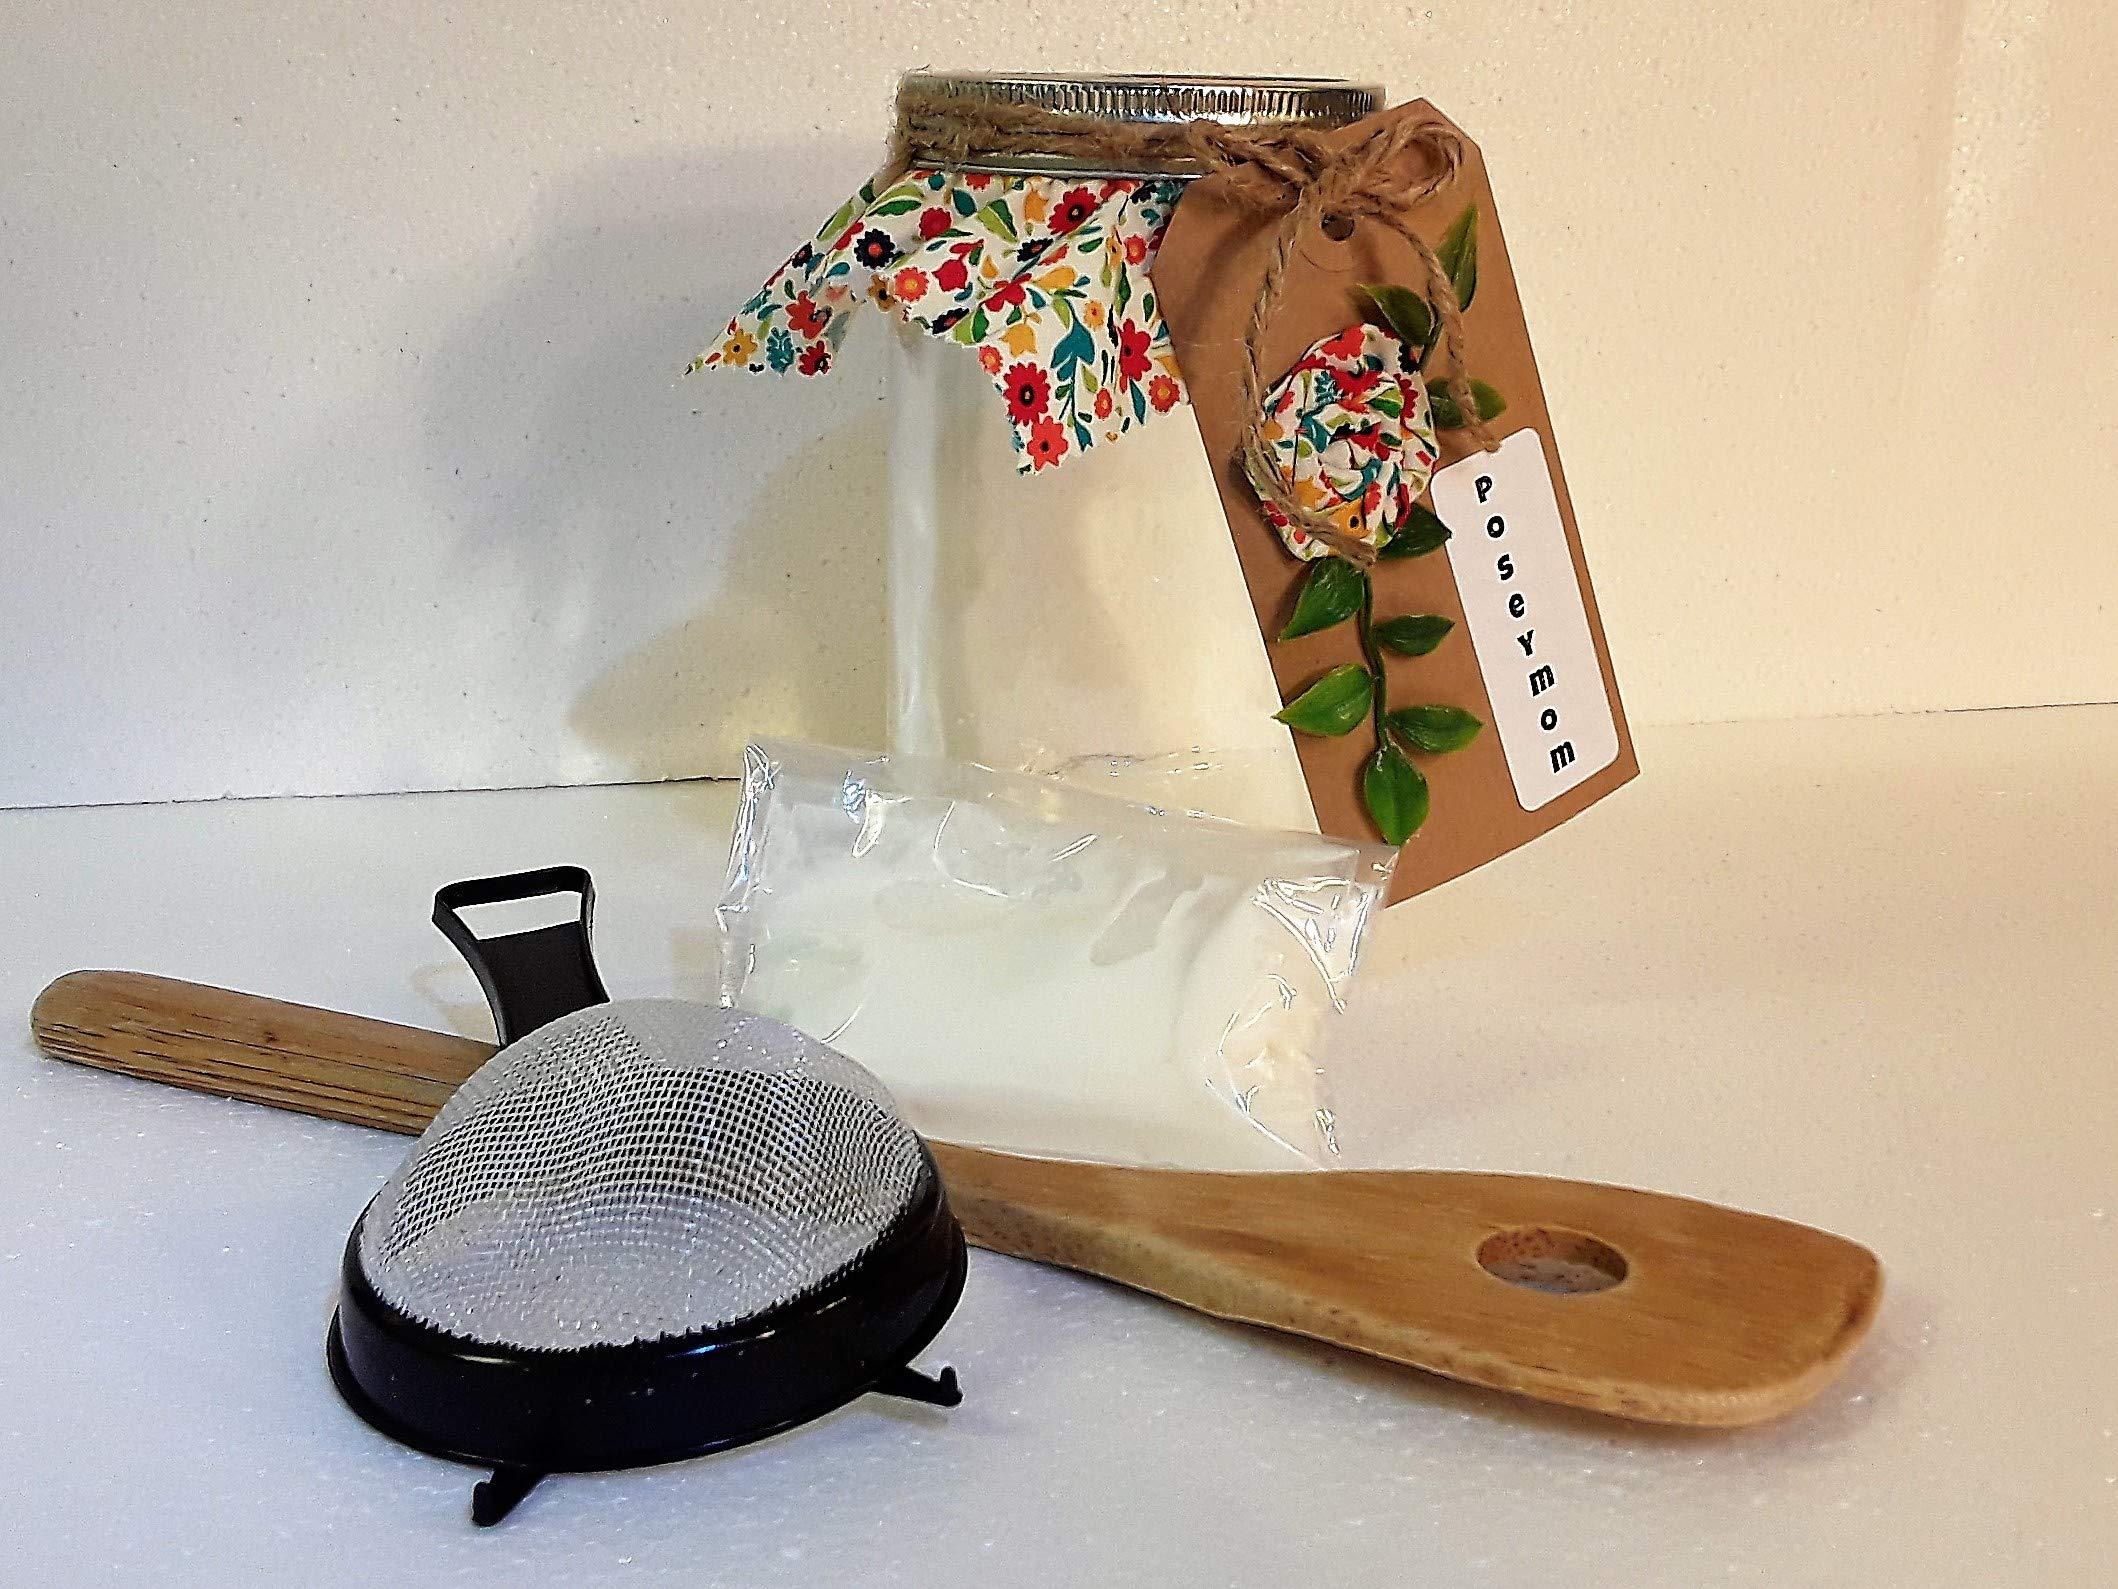 Poseymoms Milk Kefir Kit